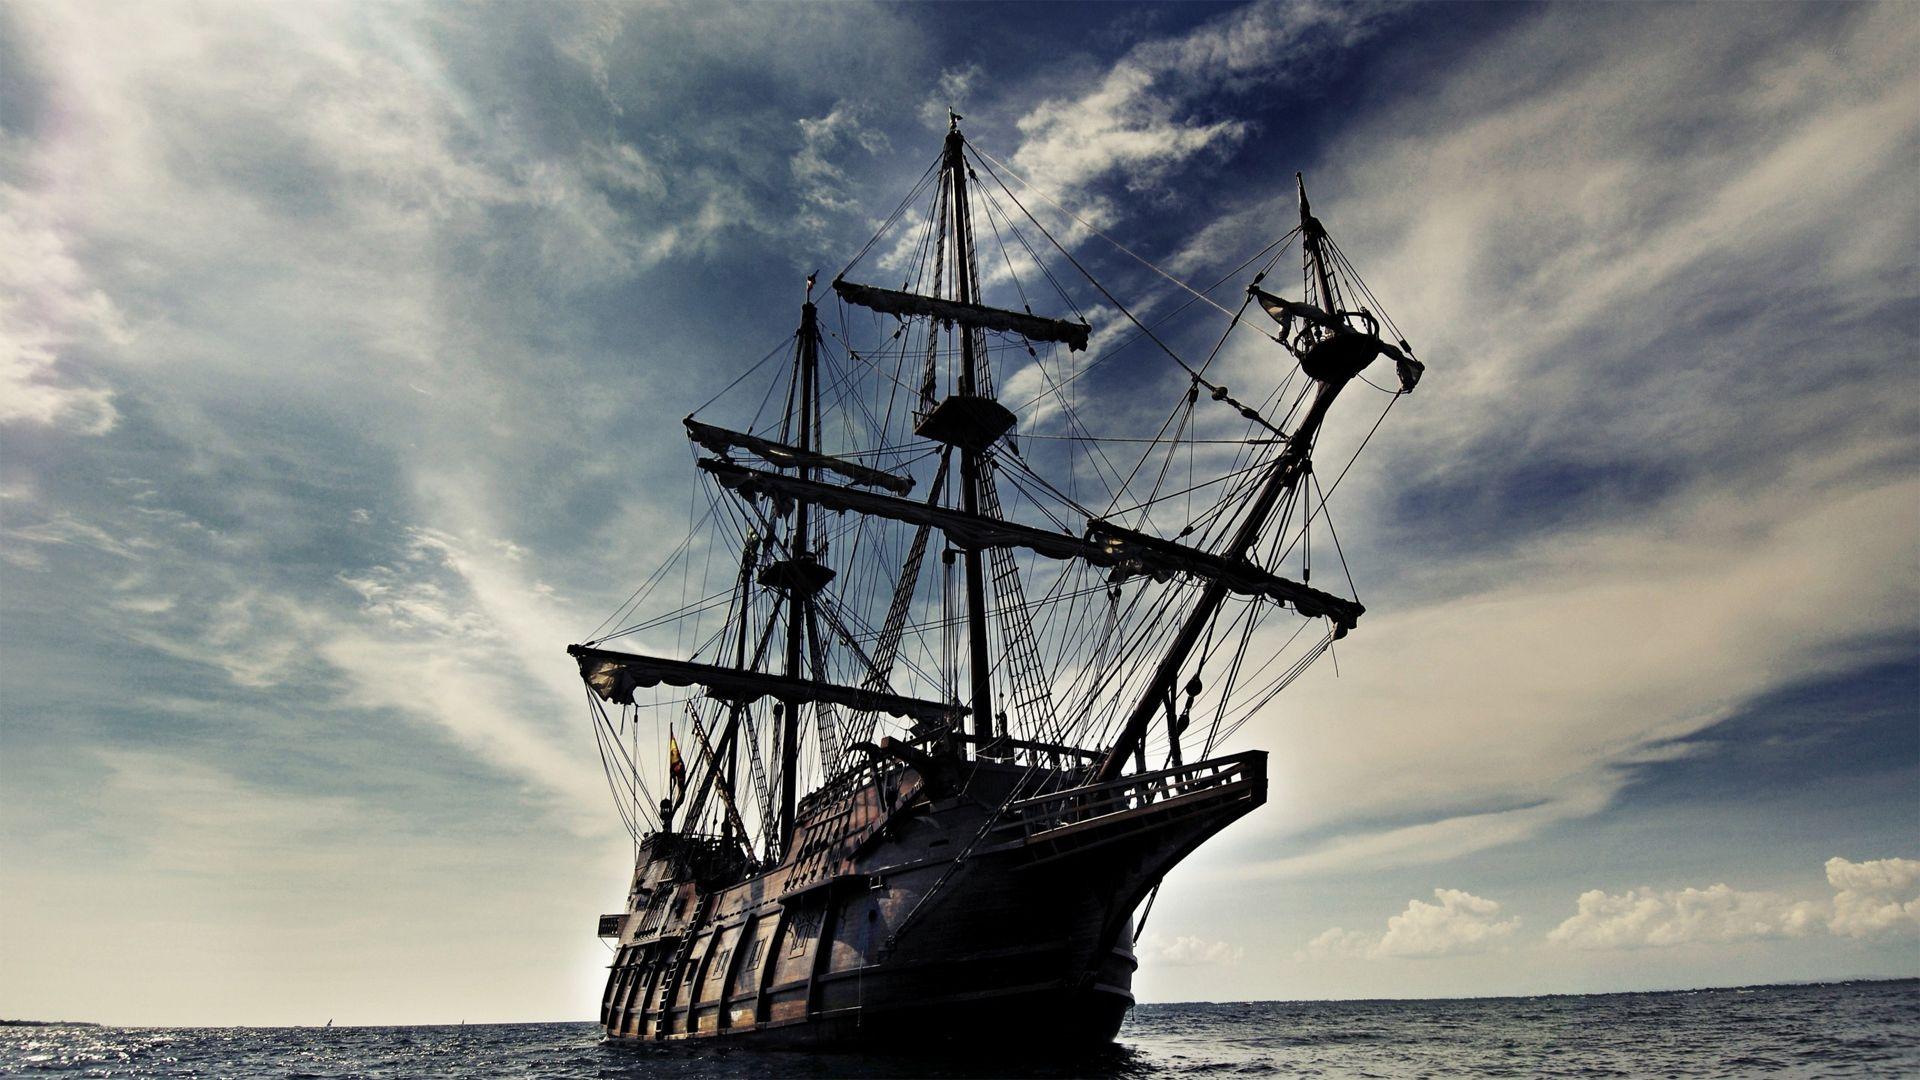 Barcos Piratas Wallpapers Barcos Piratas Reales Fondos Hd